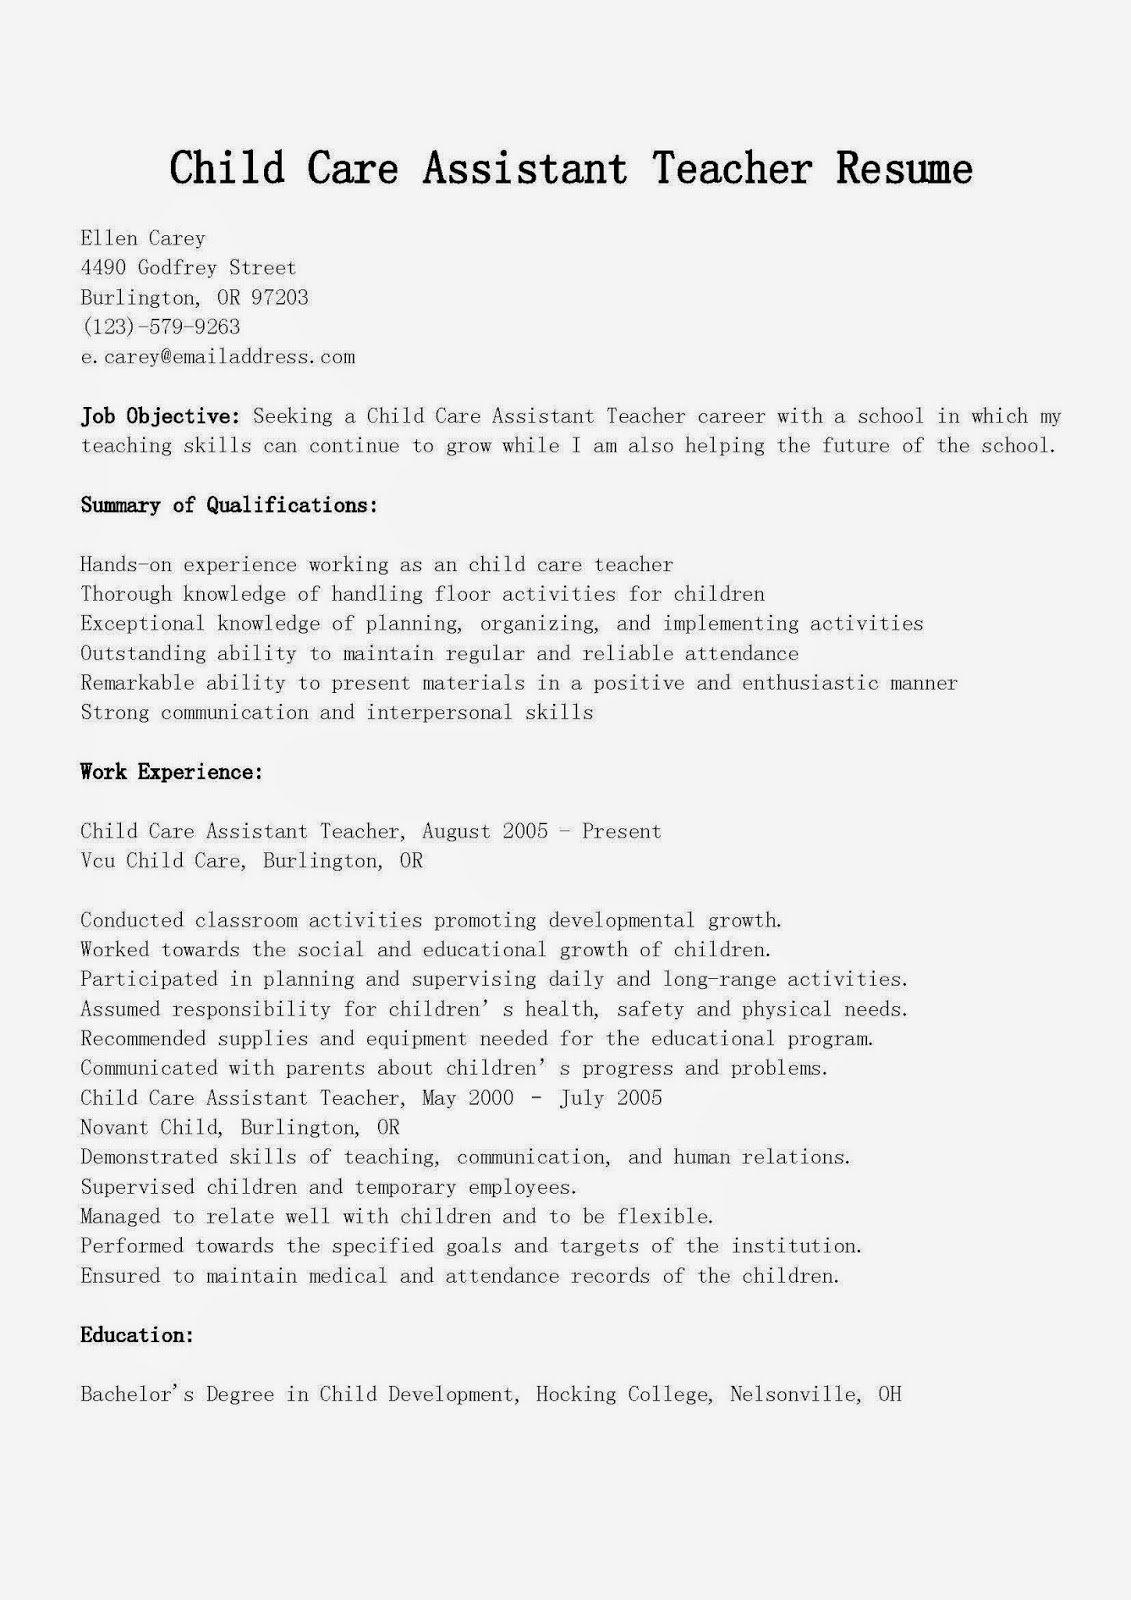 Sample Resume for Child Care New Resume Samples Child Care assistant Teacher Resume Sample